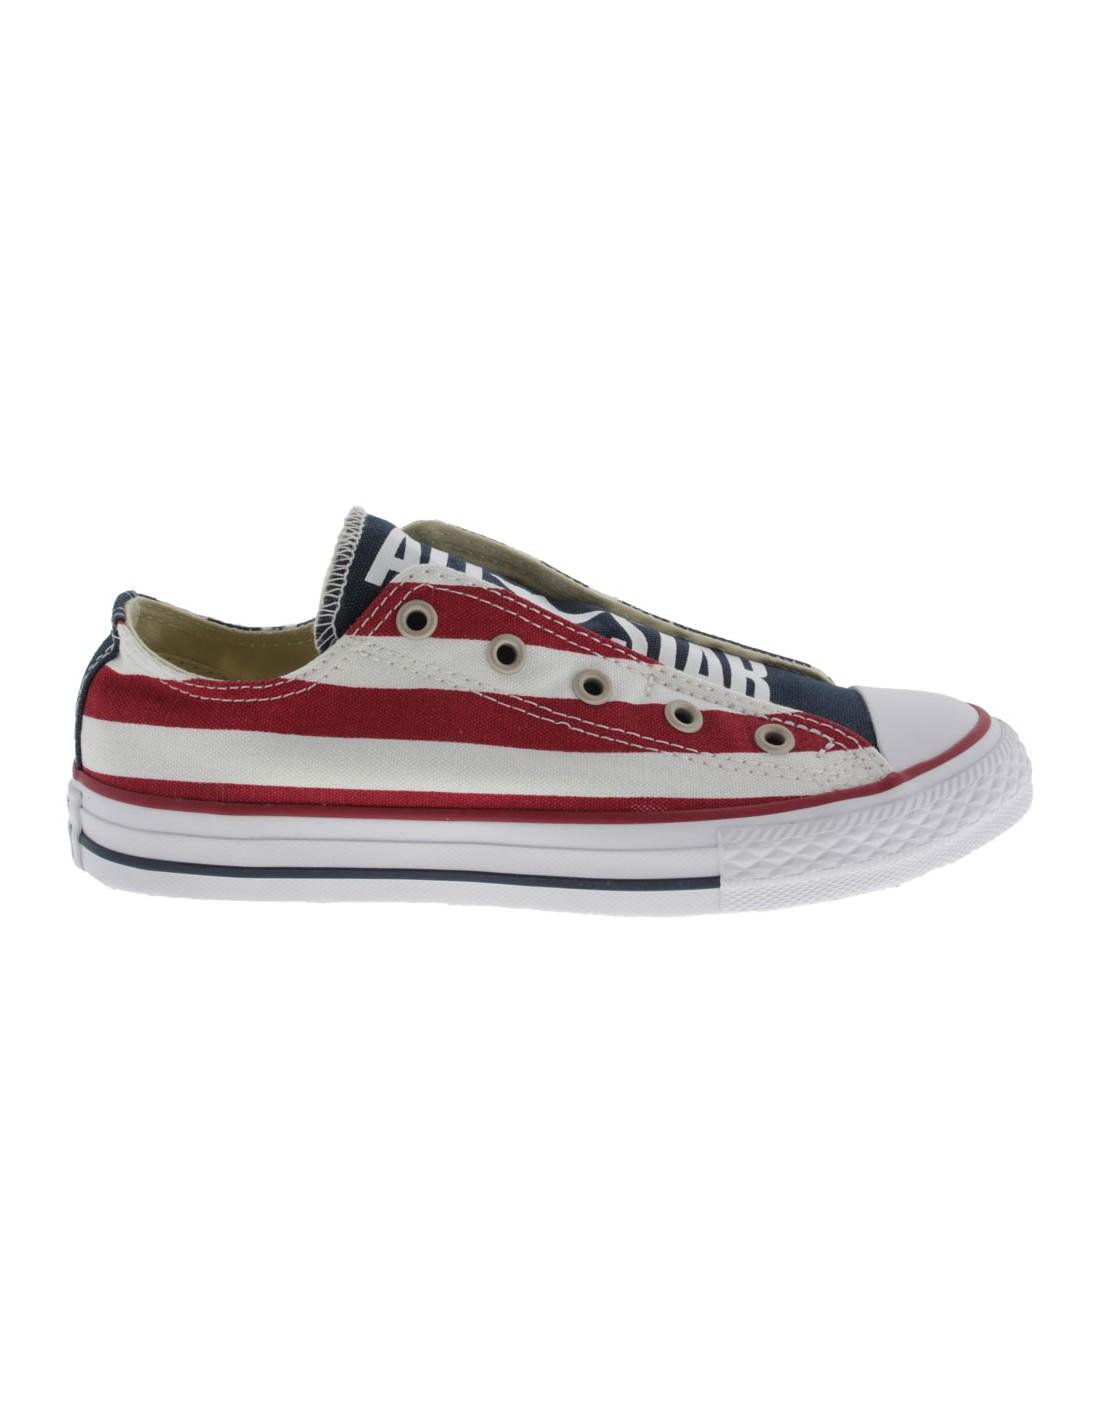 2bambino scarpe converse